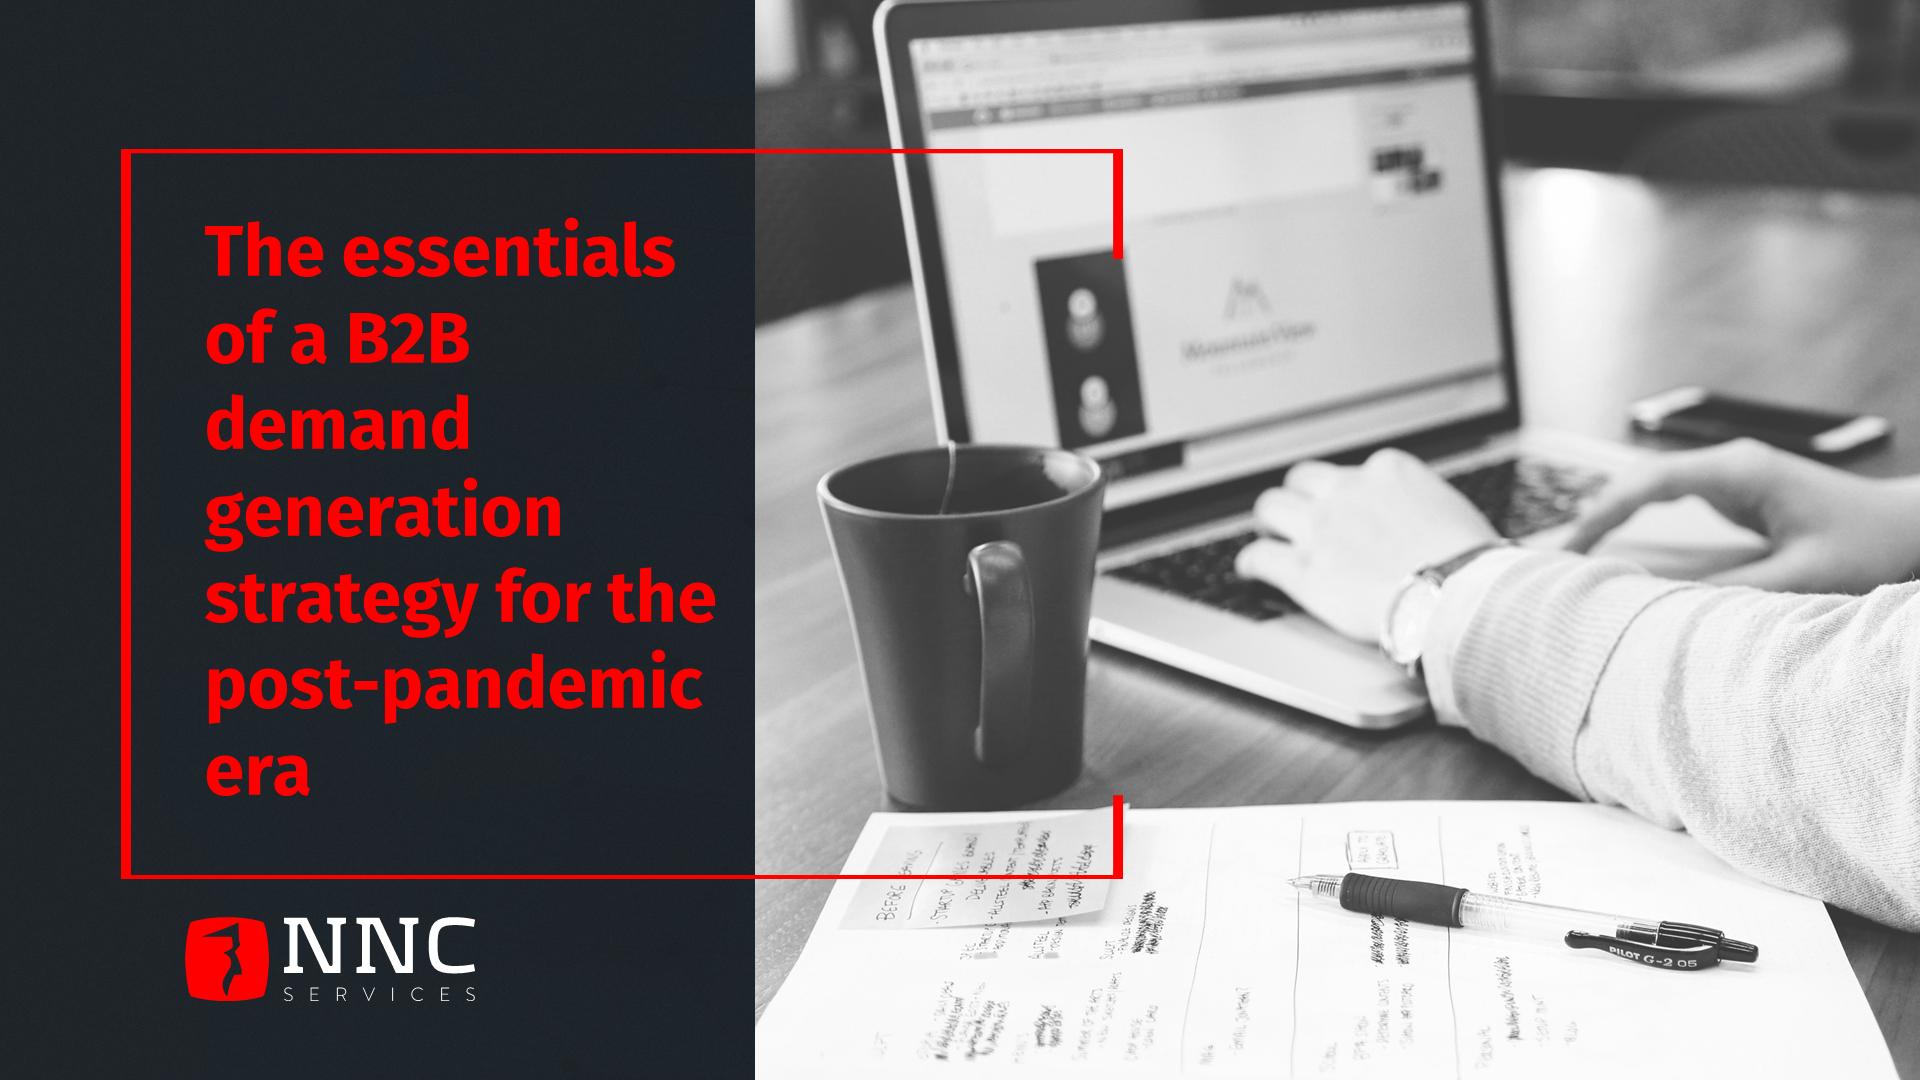 NNC Services B2B demand generation